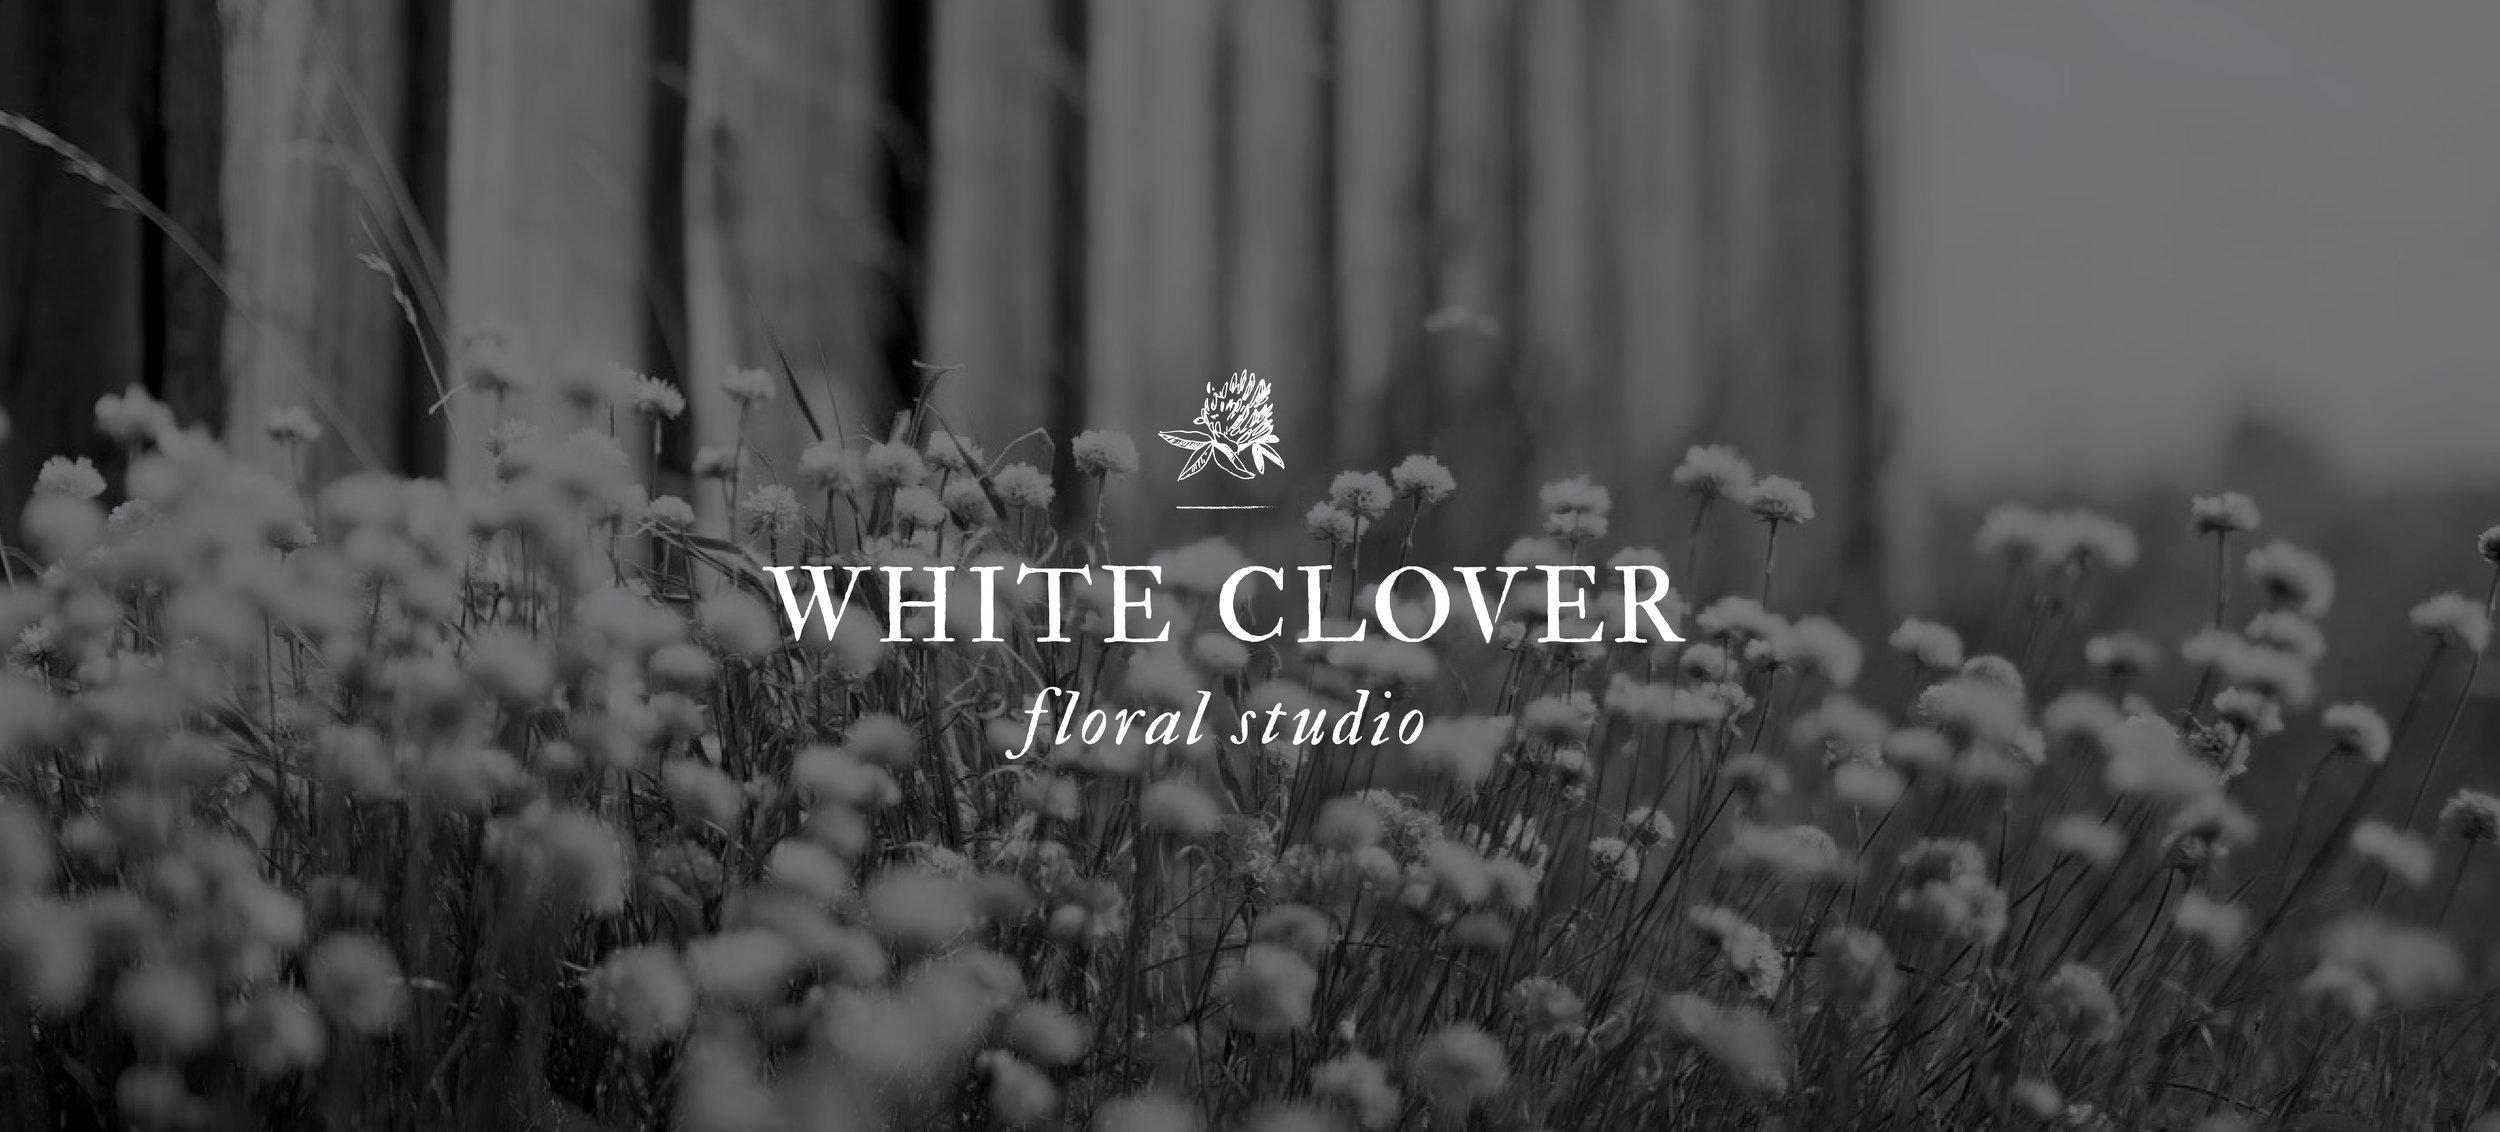 Brand_Identity_WhiteClover2.jpg